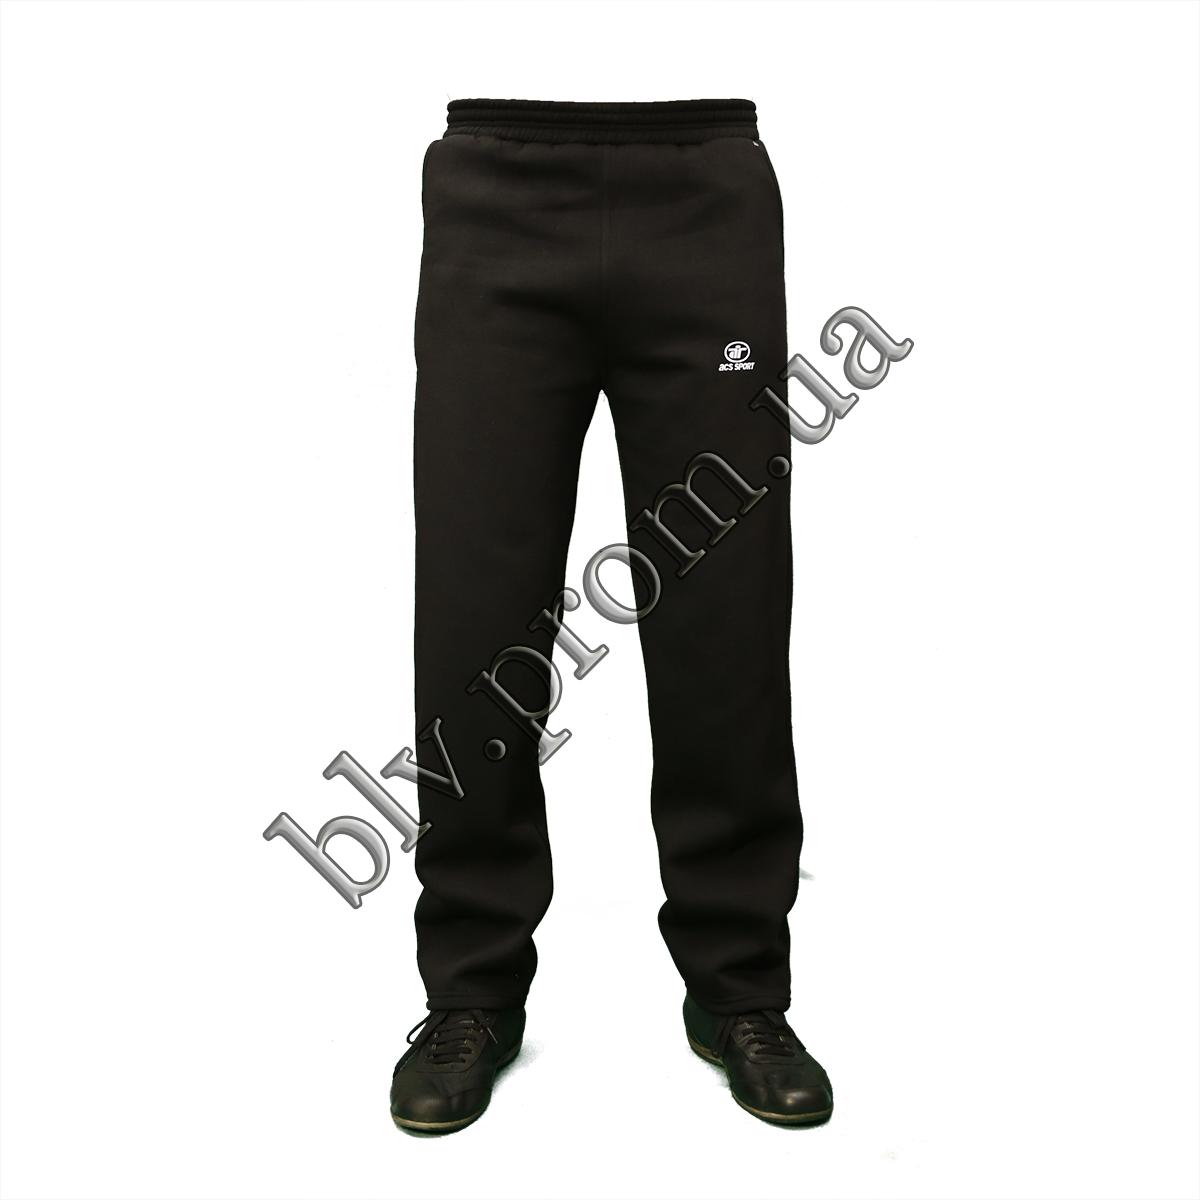 Теплые мужские брюки байка пр-во Турция KD759 Black